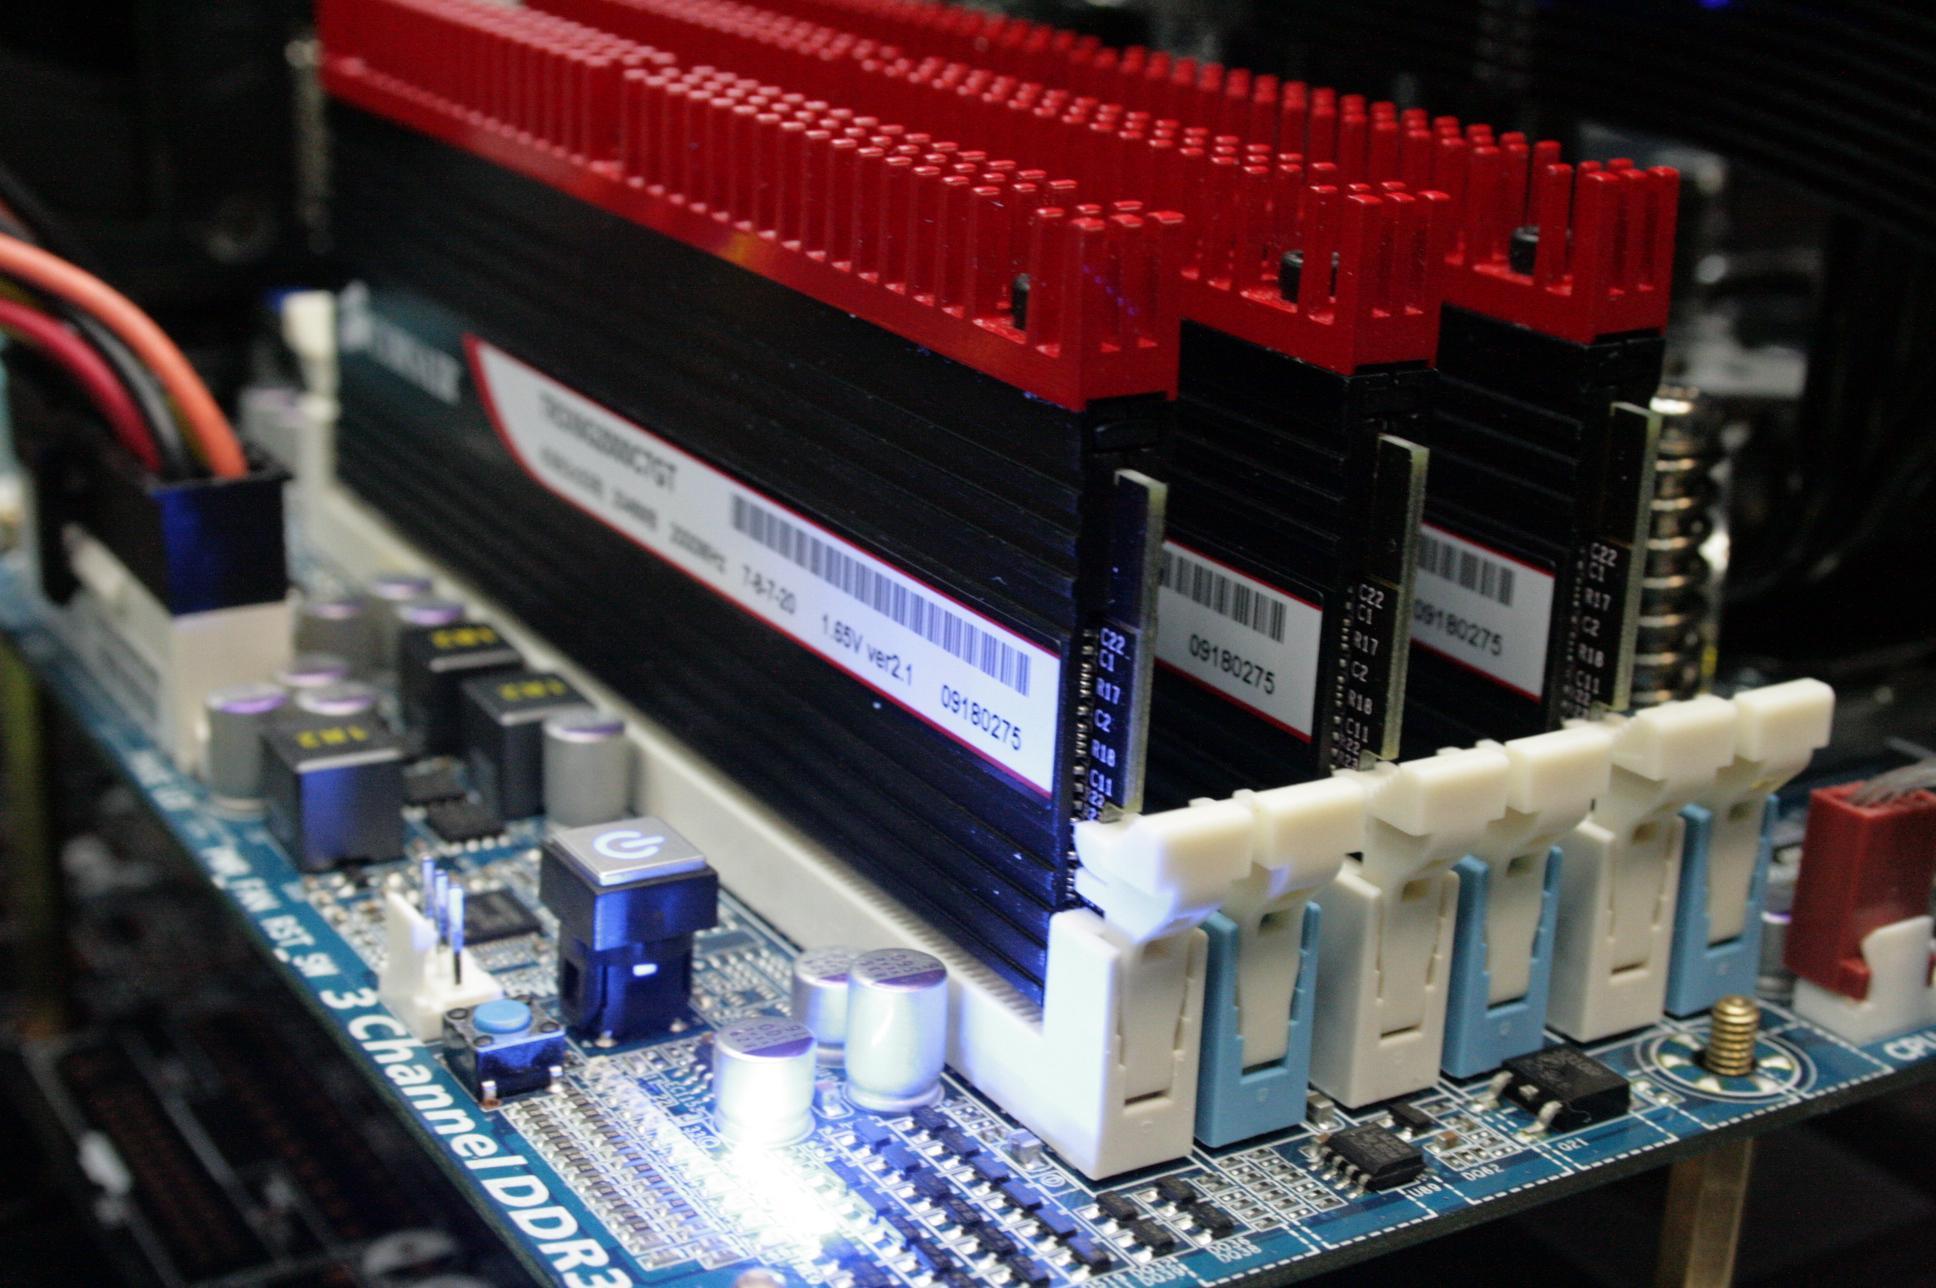 Тестируем NVIDIA GTX295 в режиме Quad-SLI